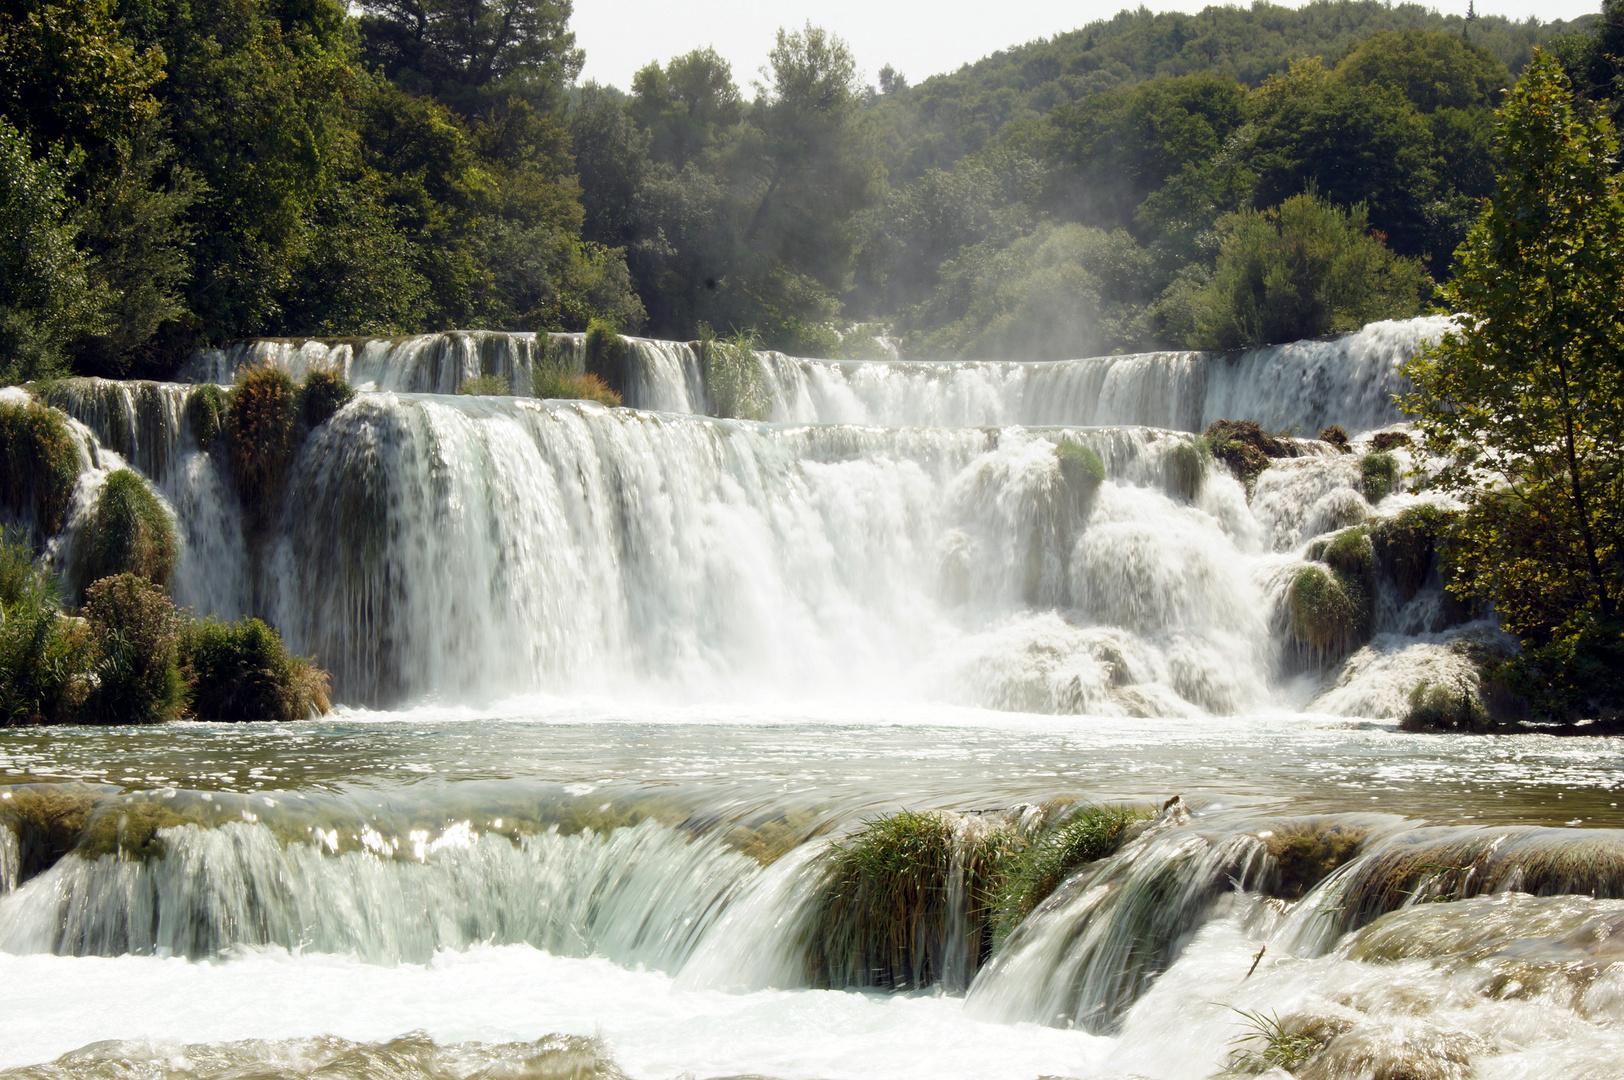 Wasserfälle im Naturschutzgebiet Krka/Dalamtien